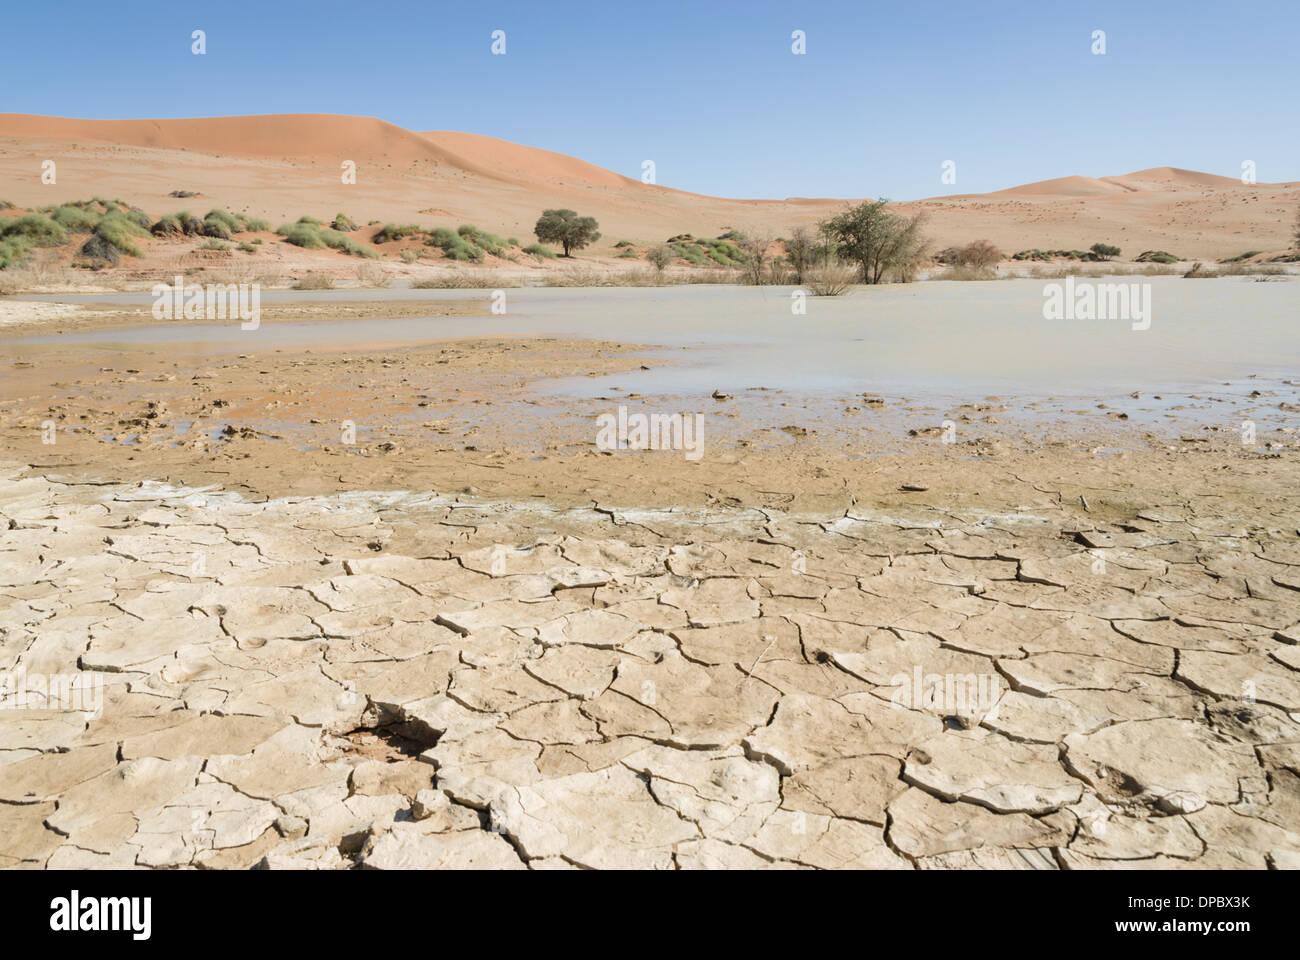 Sossusvlei lake, Namib  Naukluft National Park, Sossusvlei, Namibia, Africa. - Stock Image